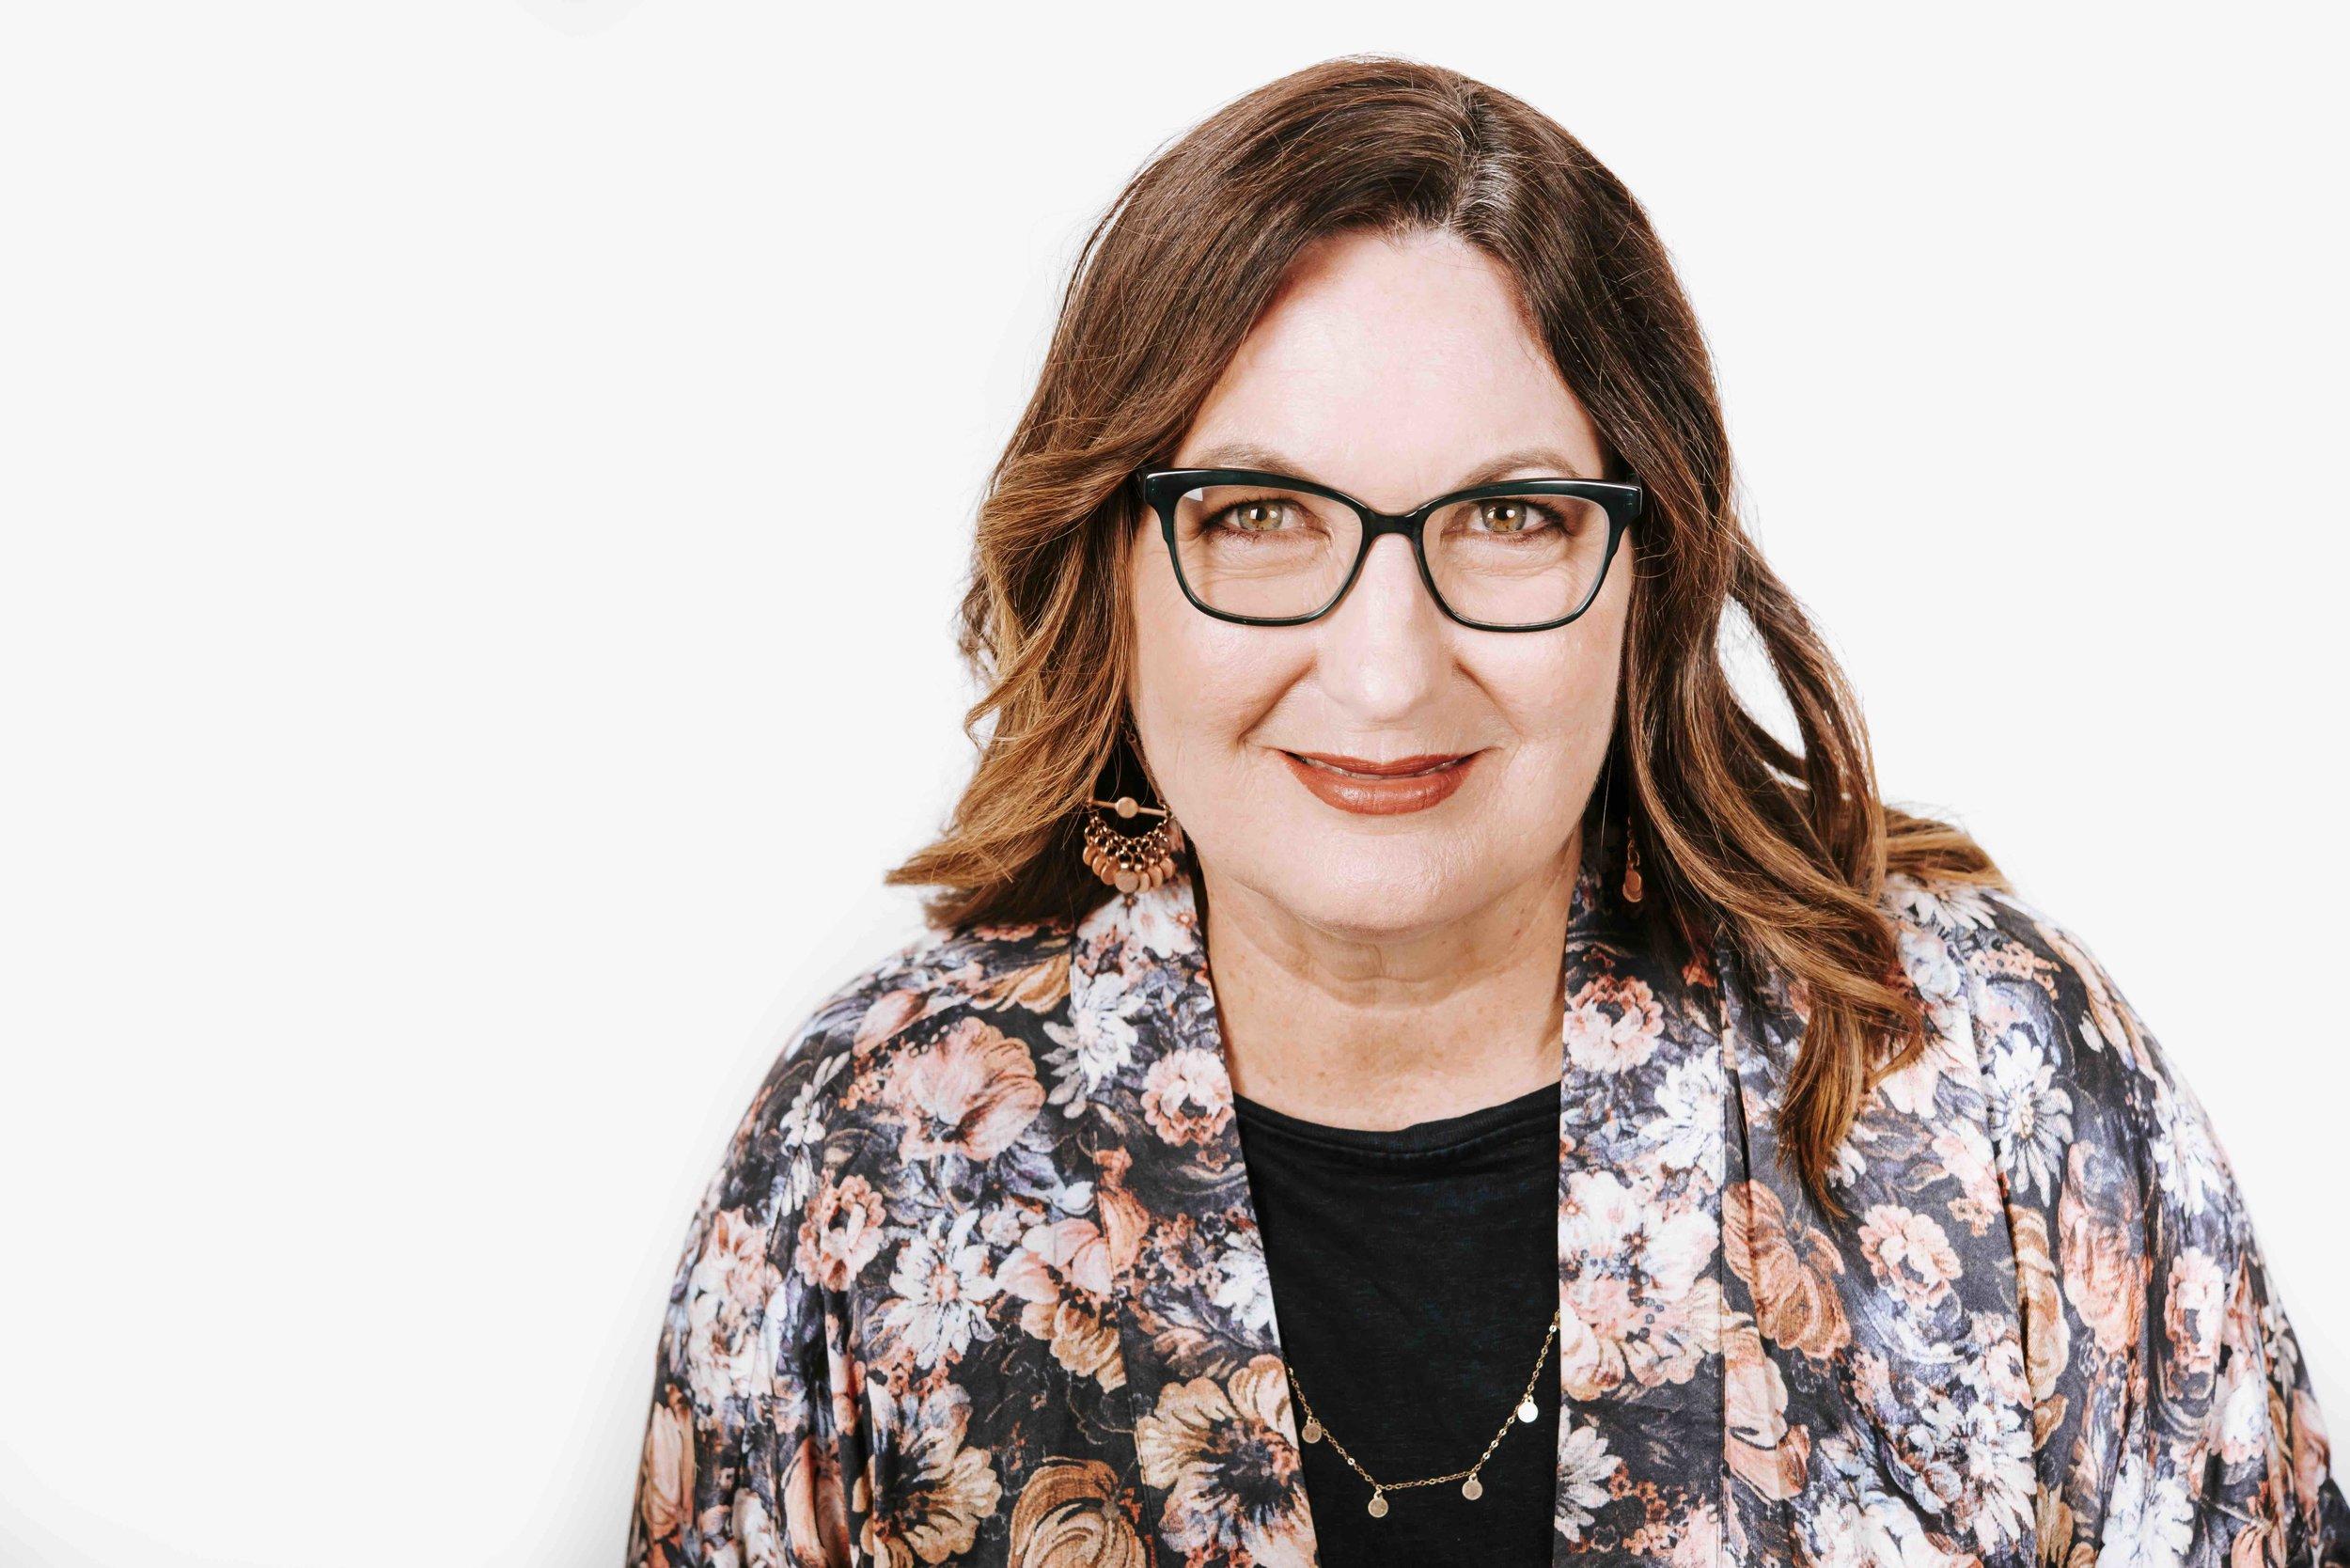 Lynne Cazaly 2019 Headshot Colour .jpg